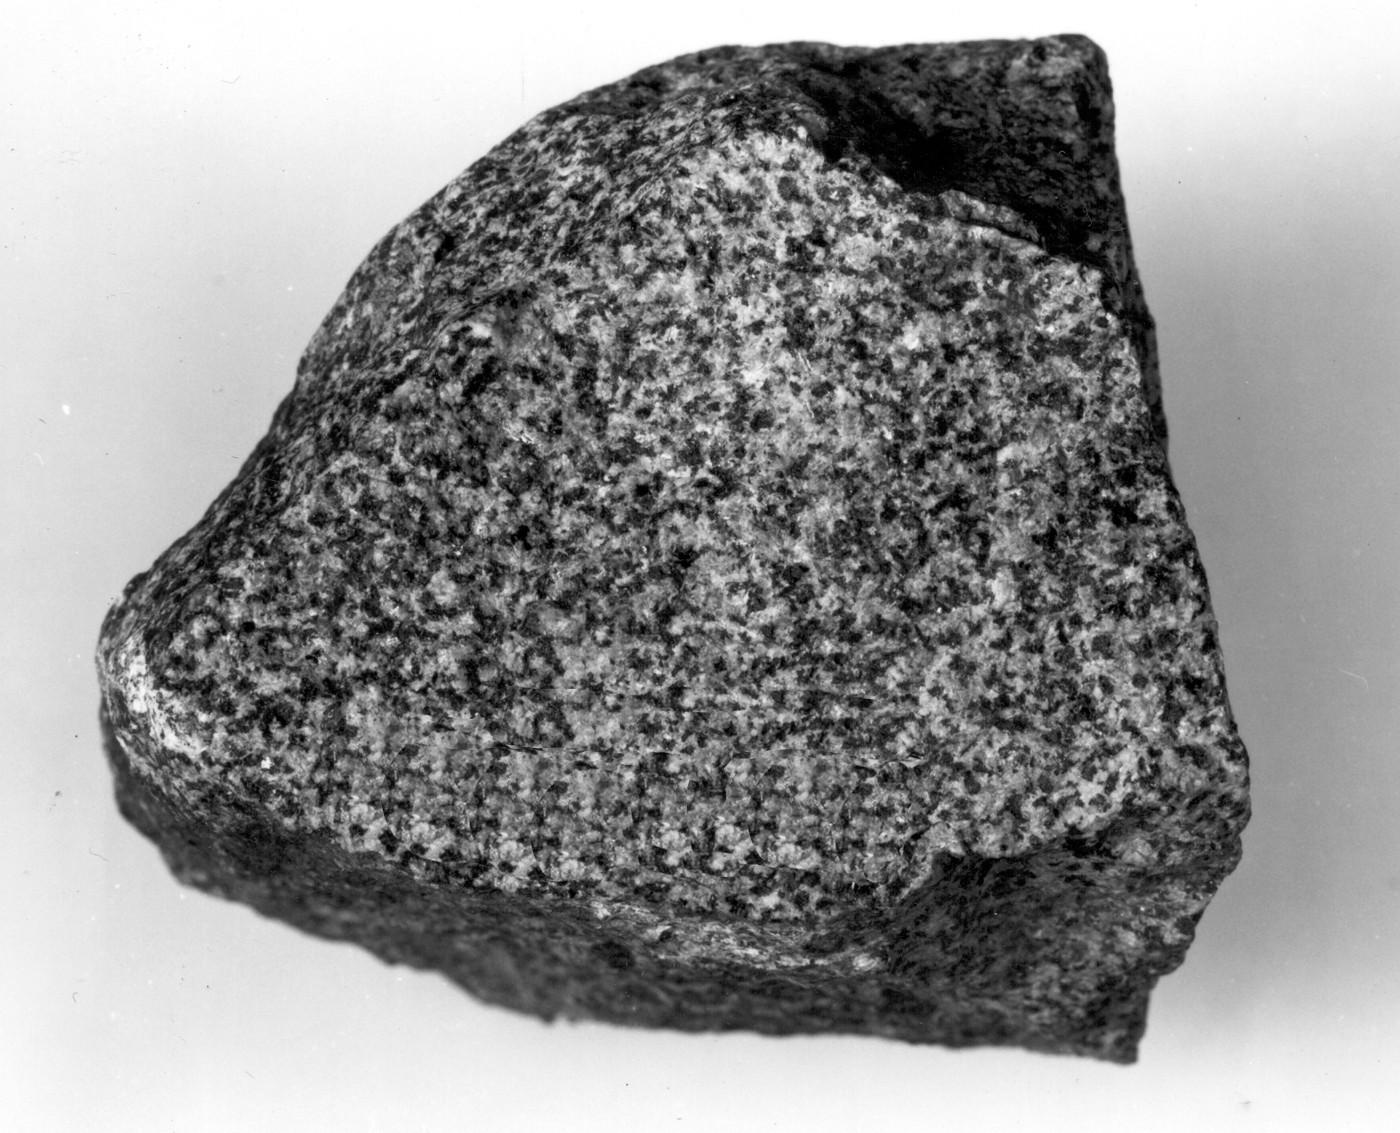 Characteristics of igneous rocks yahoo dating 8